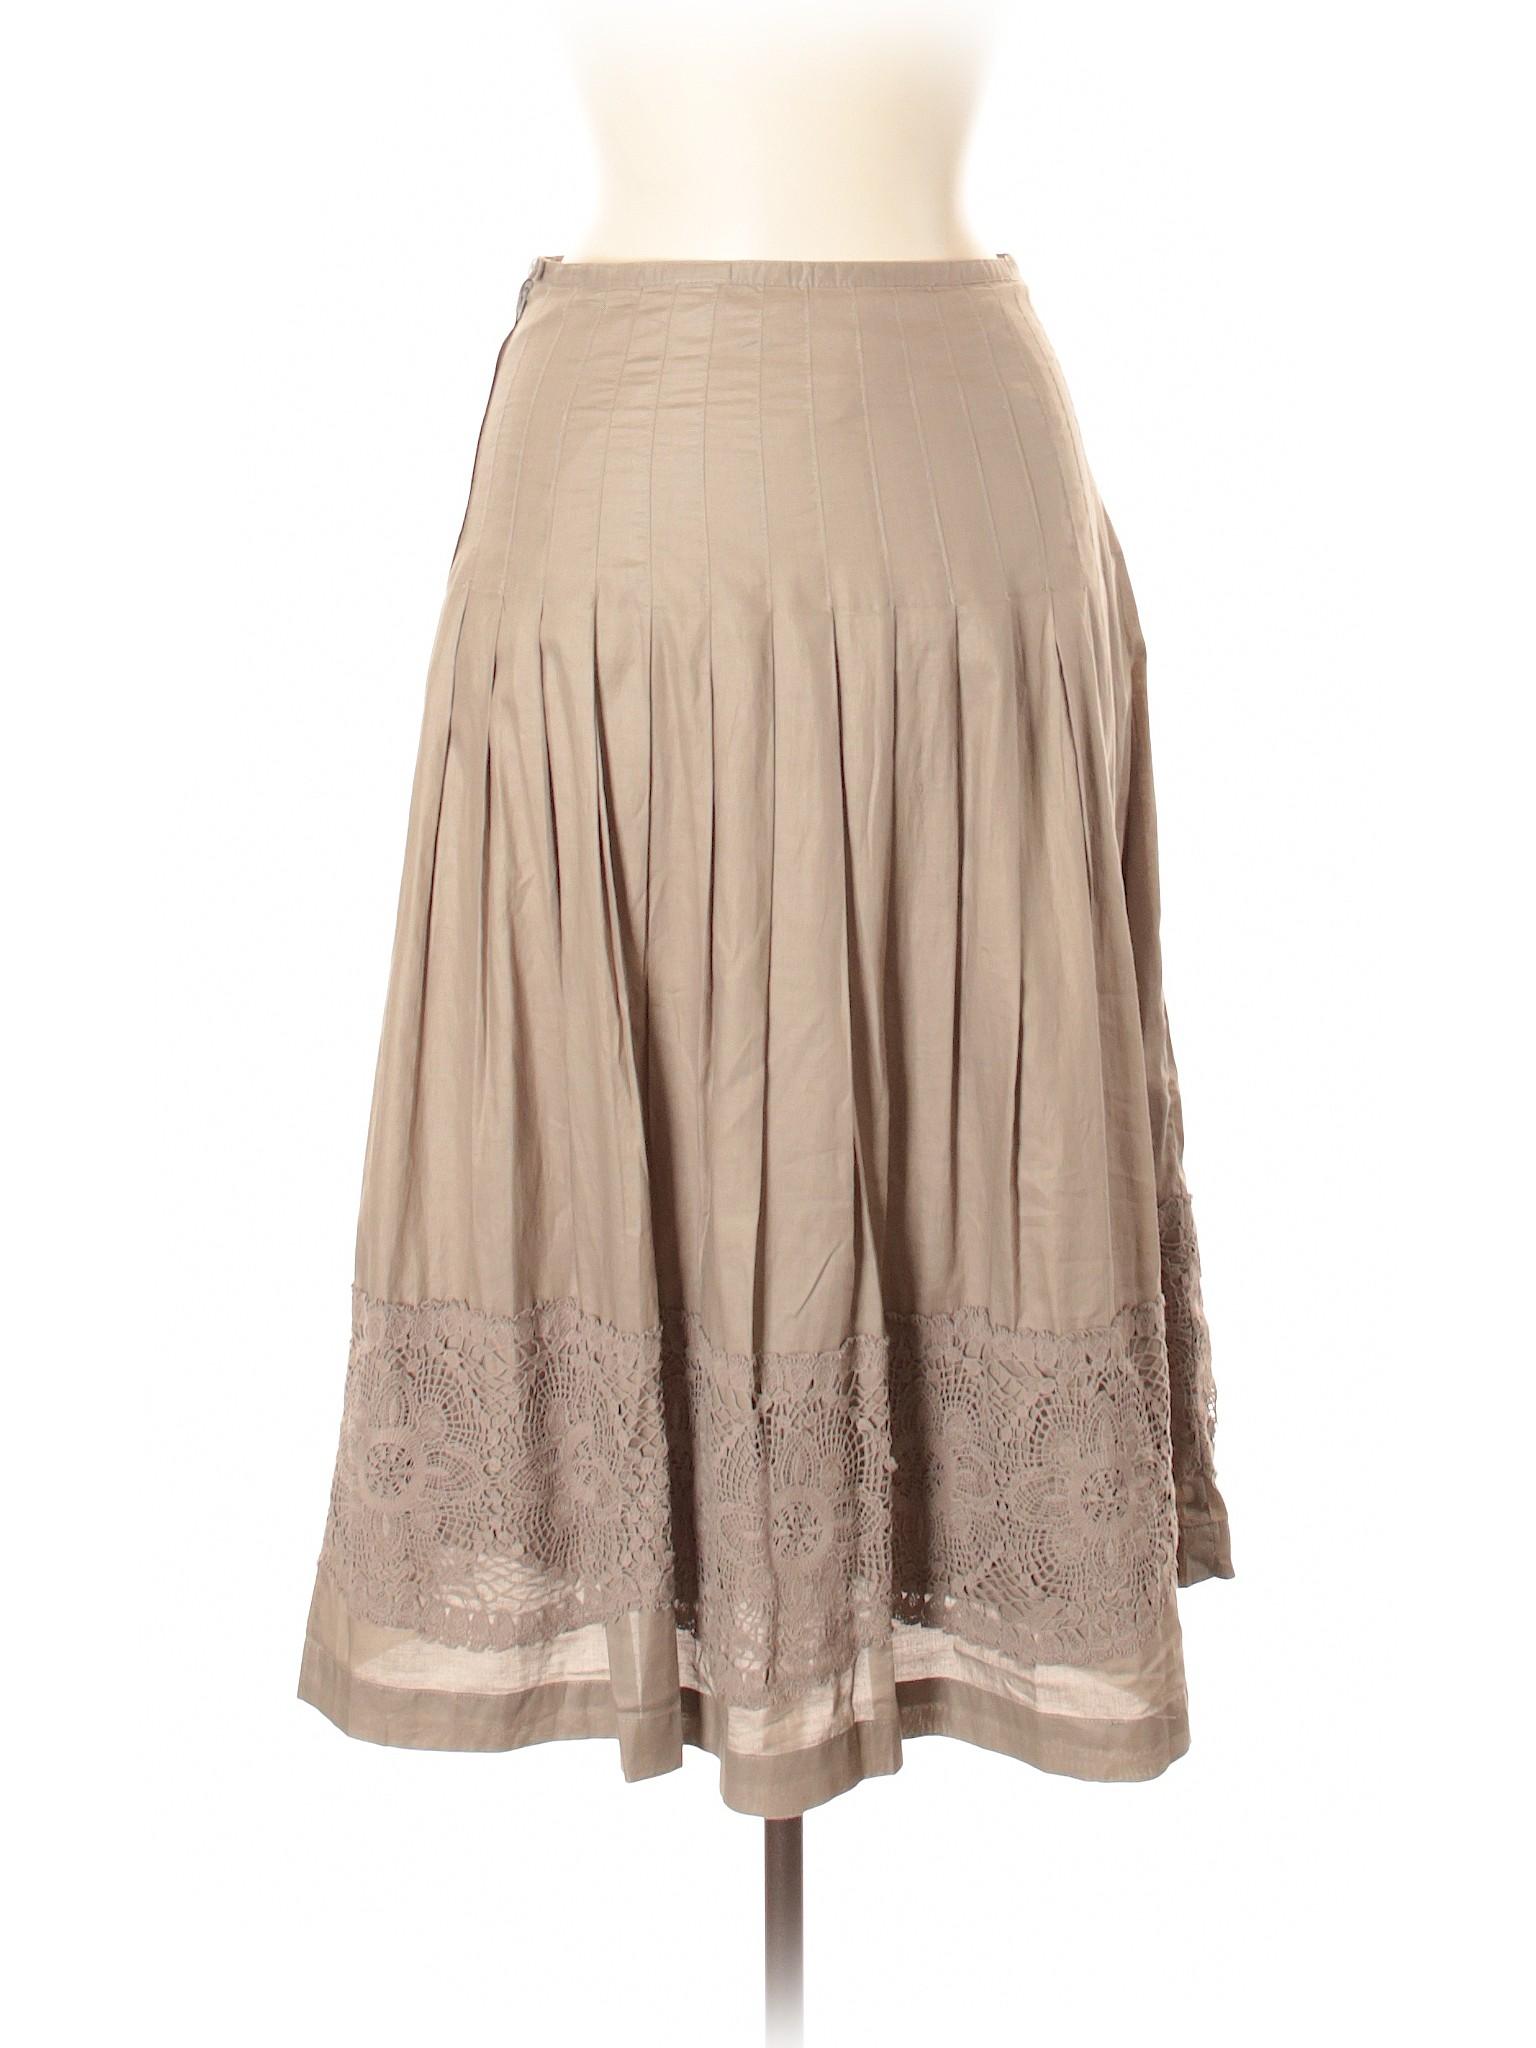 Casual Boutique Casual Skirt Boutique Skirt Boutique Boutique Skirt Boutique Casual Casual Boutique Casual Skirt Casual Skirt BBPdqw4Sr